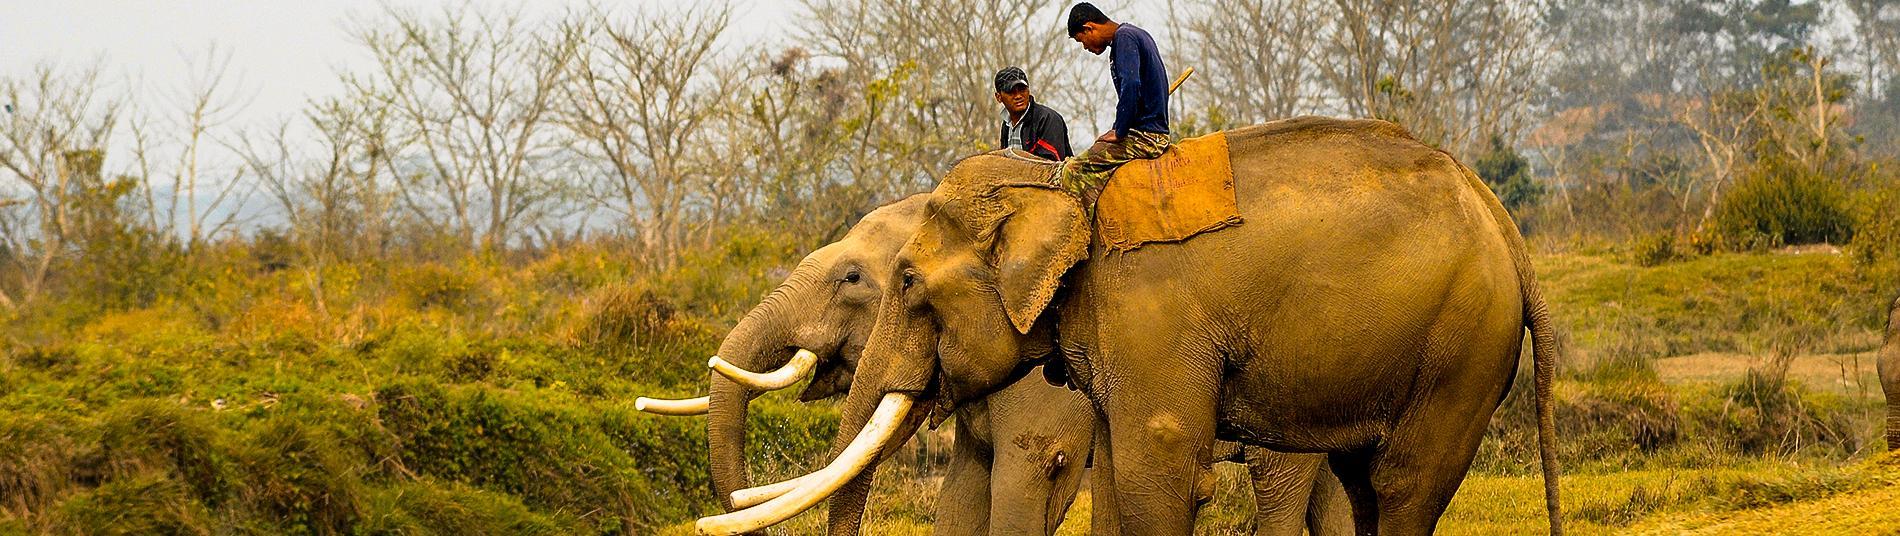 Elephant breeding centerr